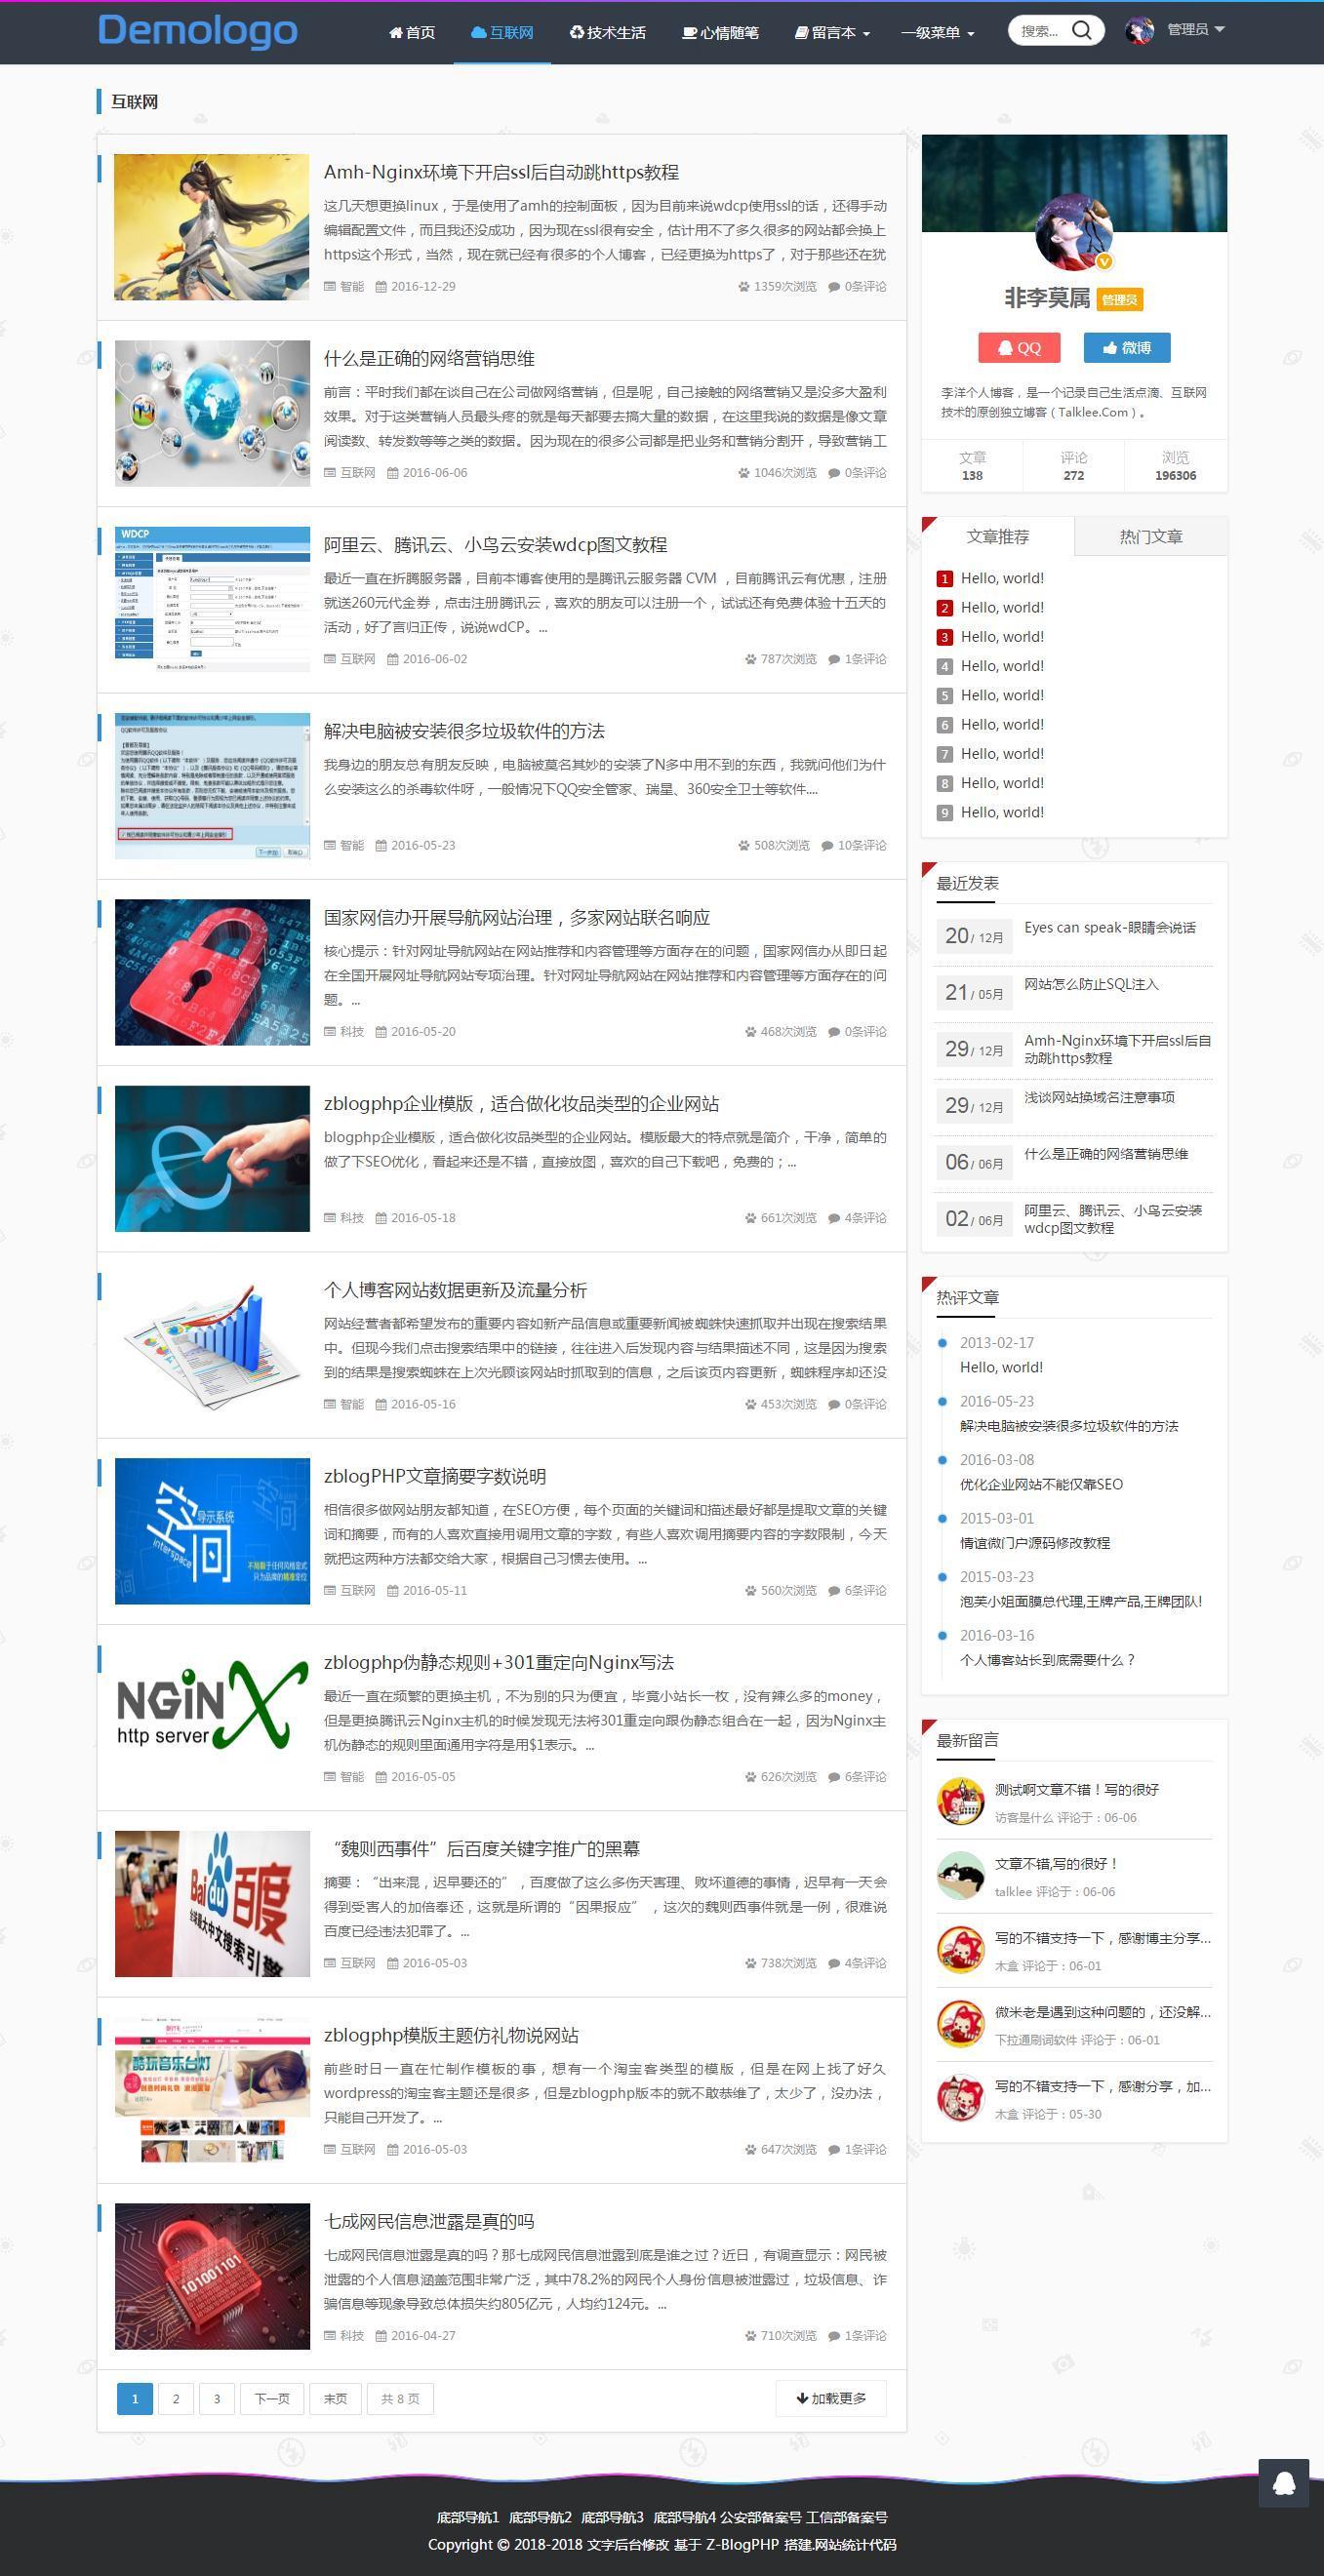 Z-BlogPHP旗舰主题开运锦鲤前来报道,Z-BlogPHP开运锦鲤前来报道(更新说明及操作教程,必看文章) 第80张,博客模板,免费,教程,资源,php,模板,QQ,第88张